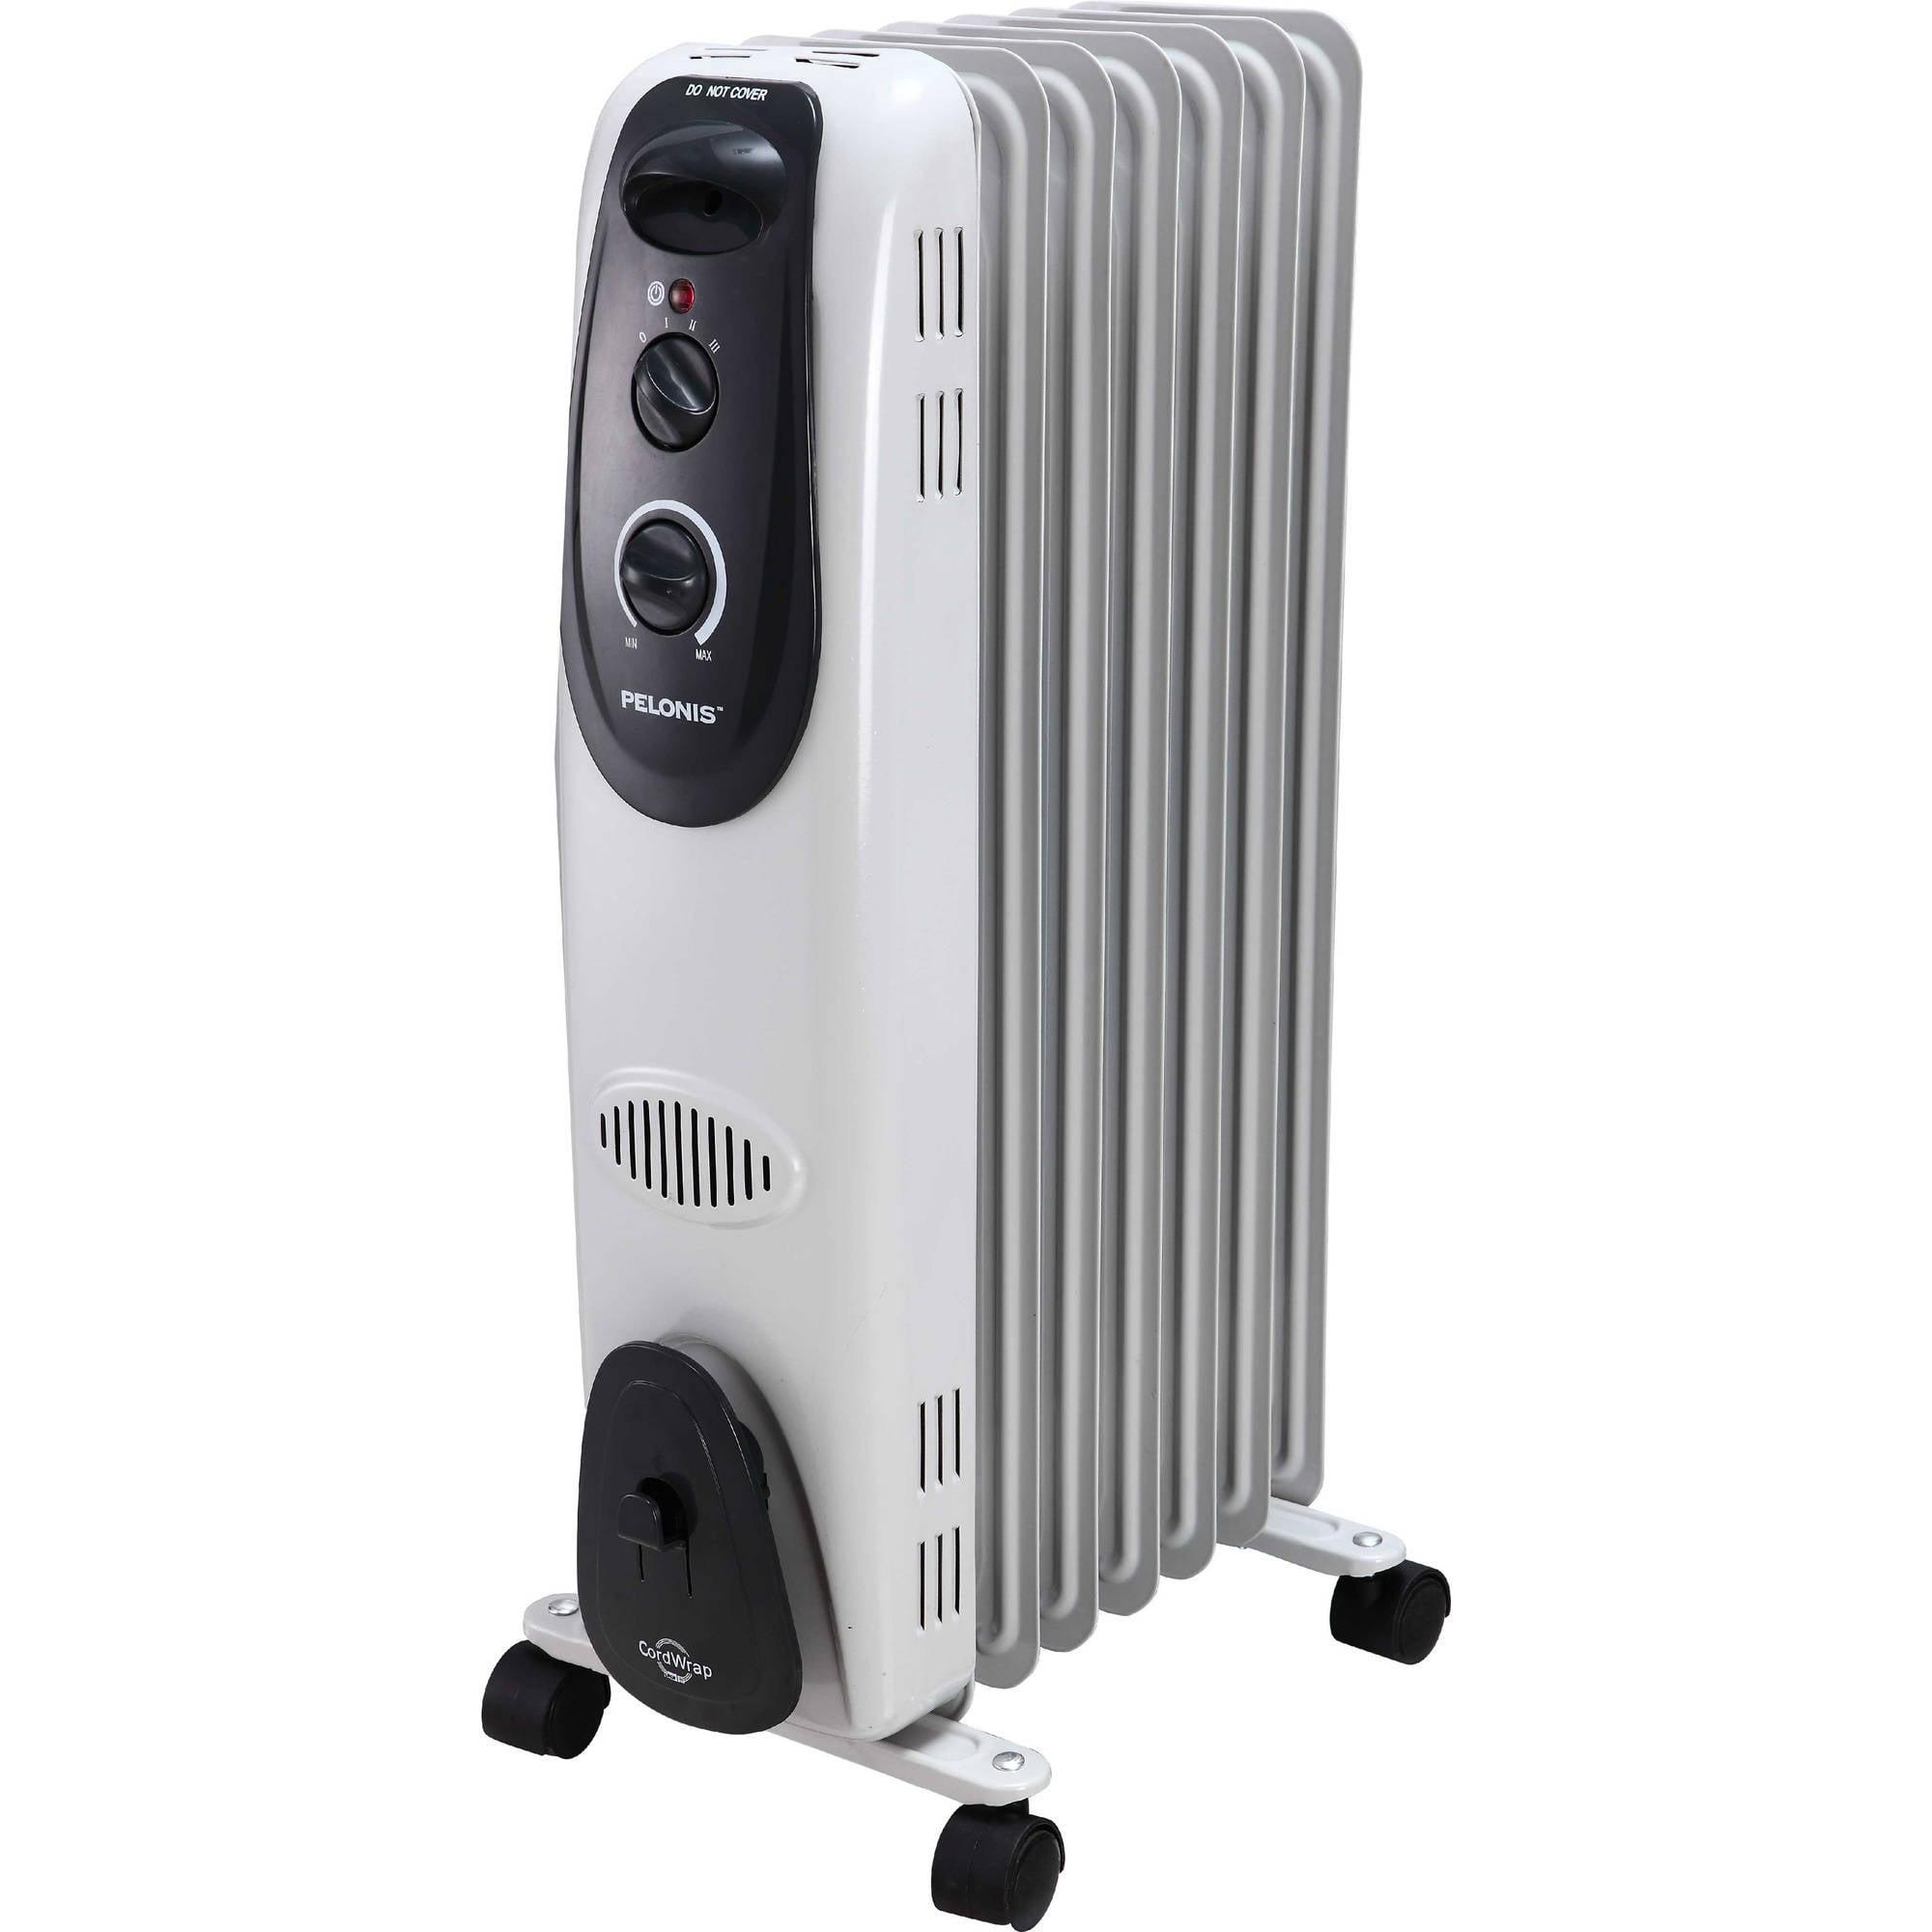 Pelonis Electric Radiator Heater, 7 Fin, Oil-Filled, #HO-0260